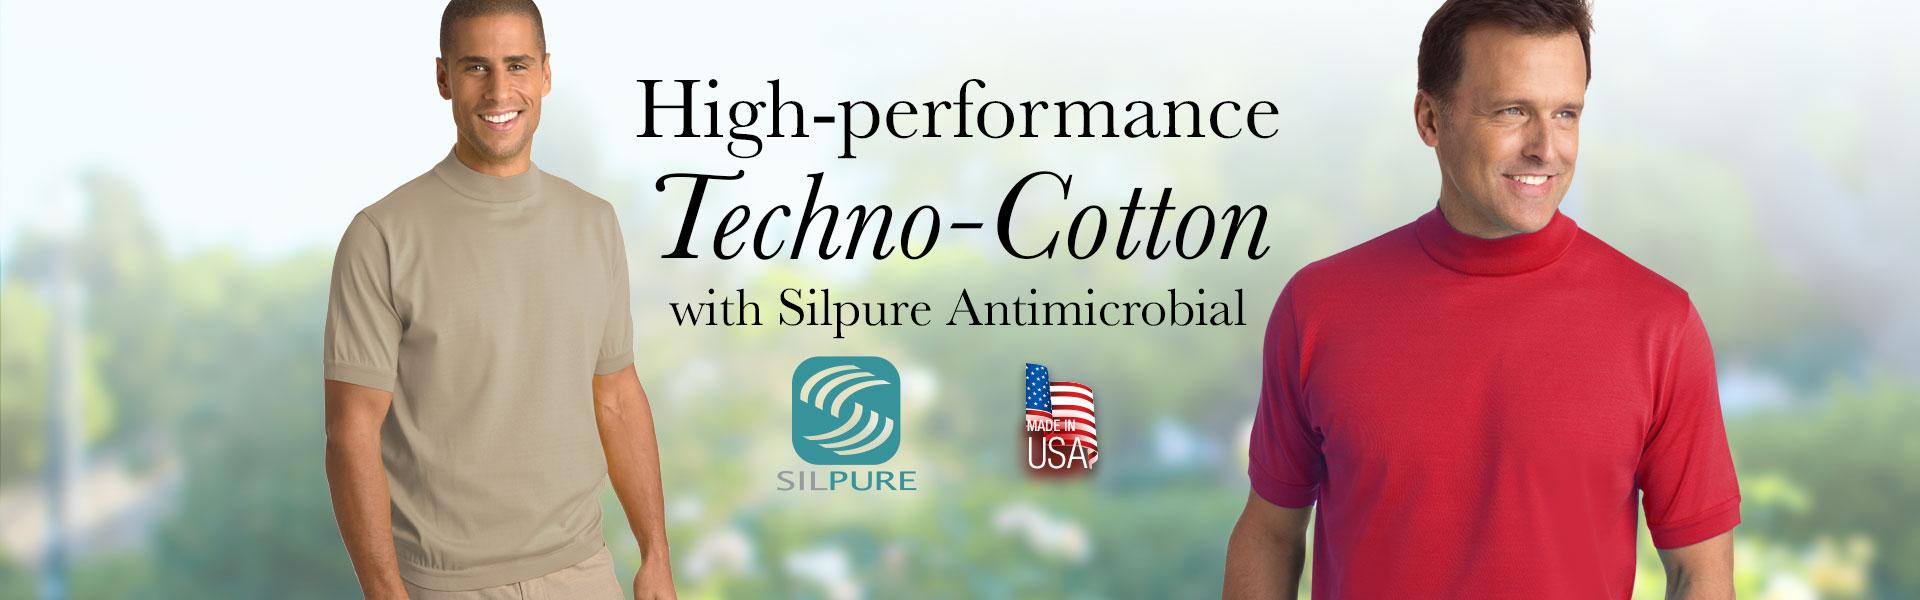 High-performance Mock Turtleneck Shirt